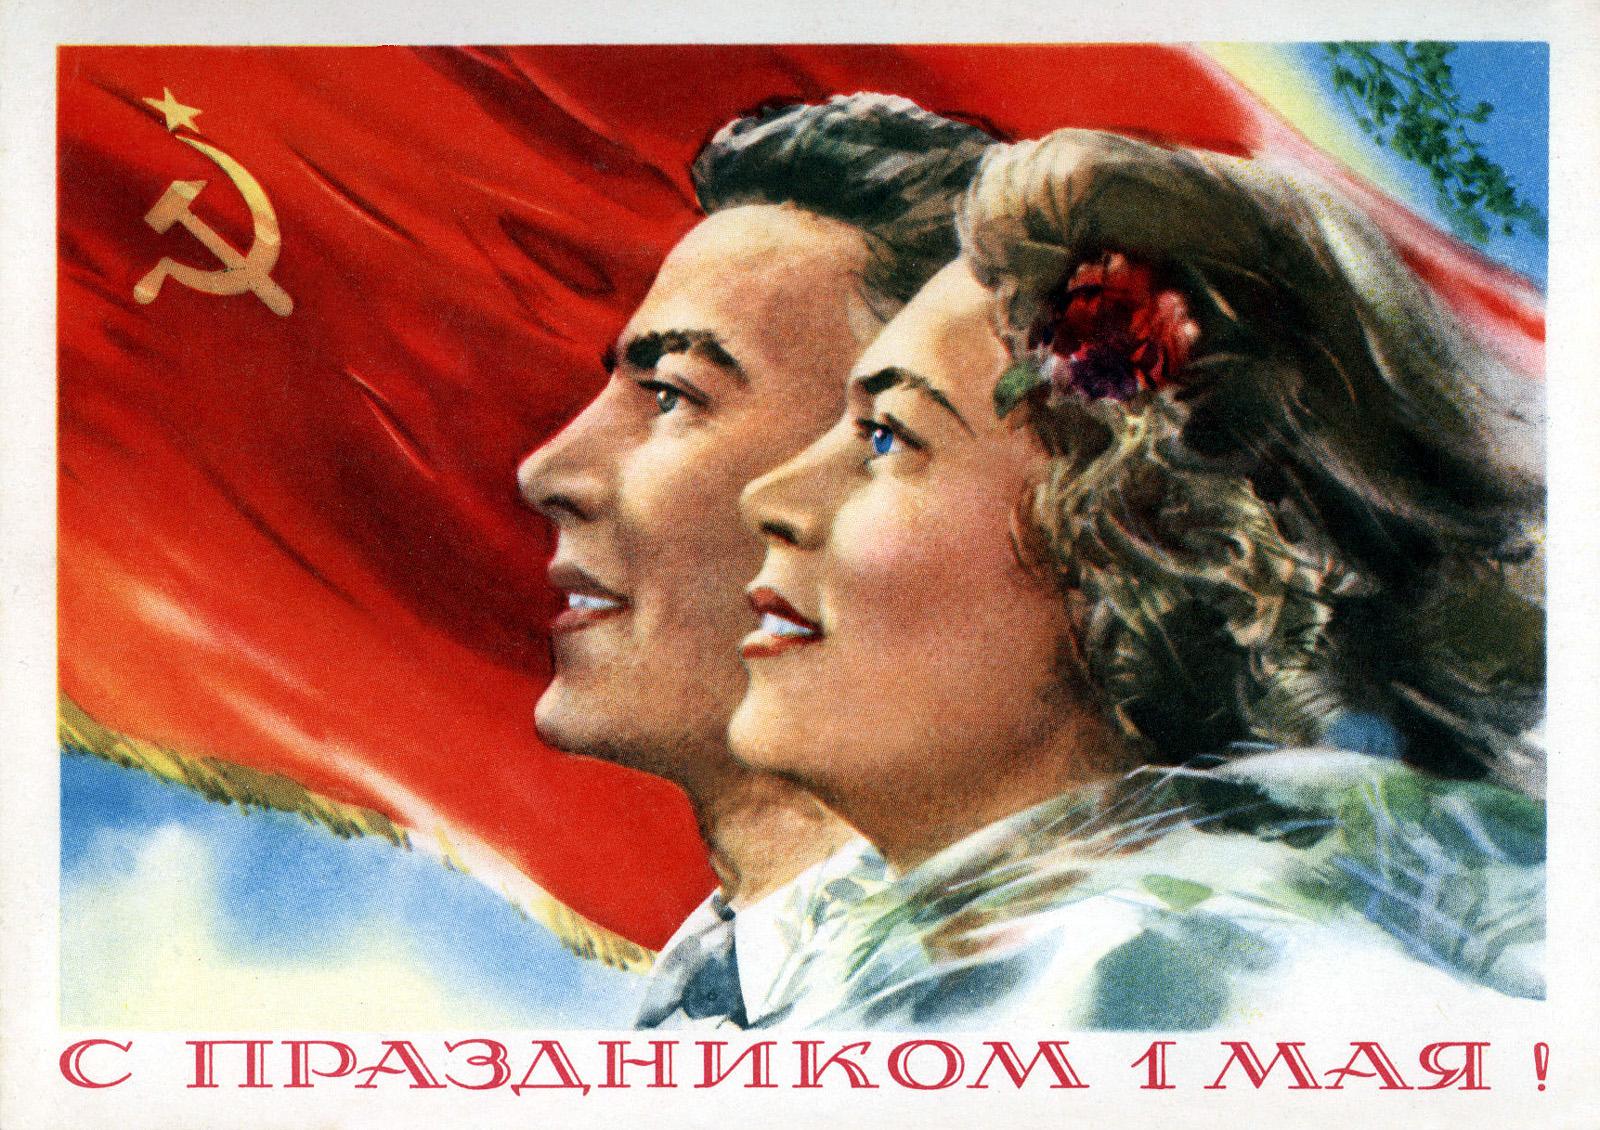 http://img-fotki.yandex.ru/get/5107/na-blyudatel.50/0_4dc94_ca11a463_orig.jpg height=653 height=581